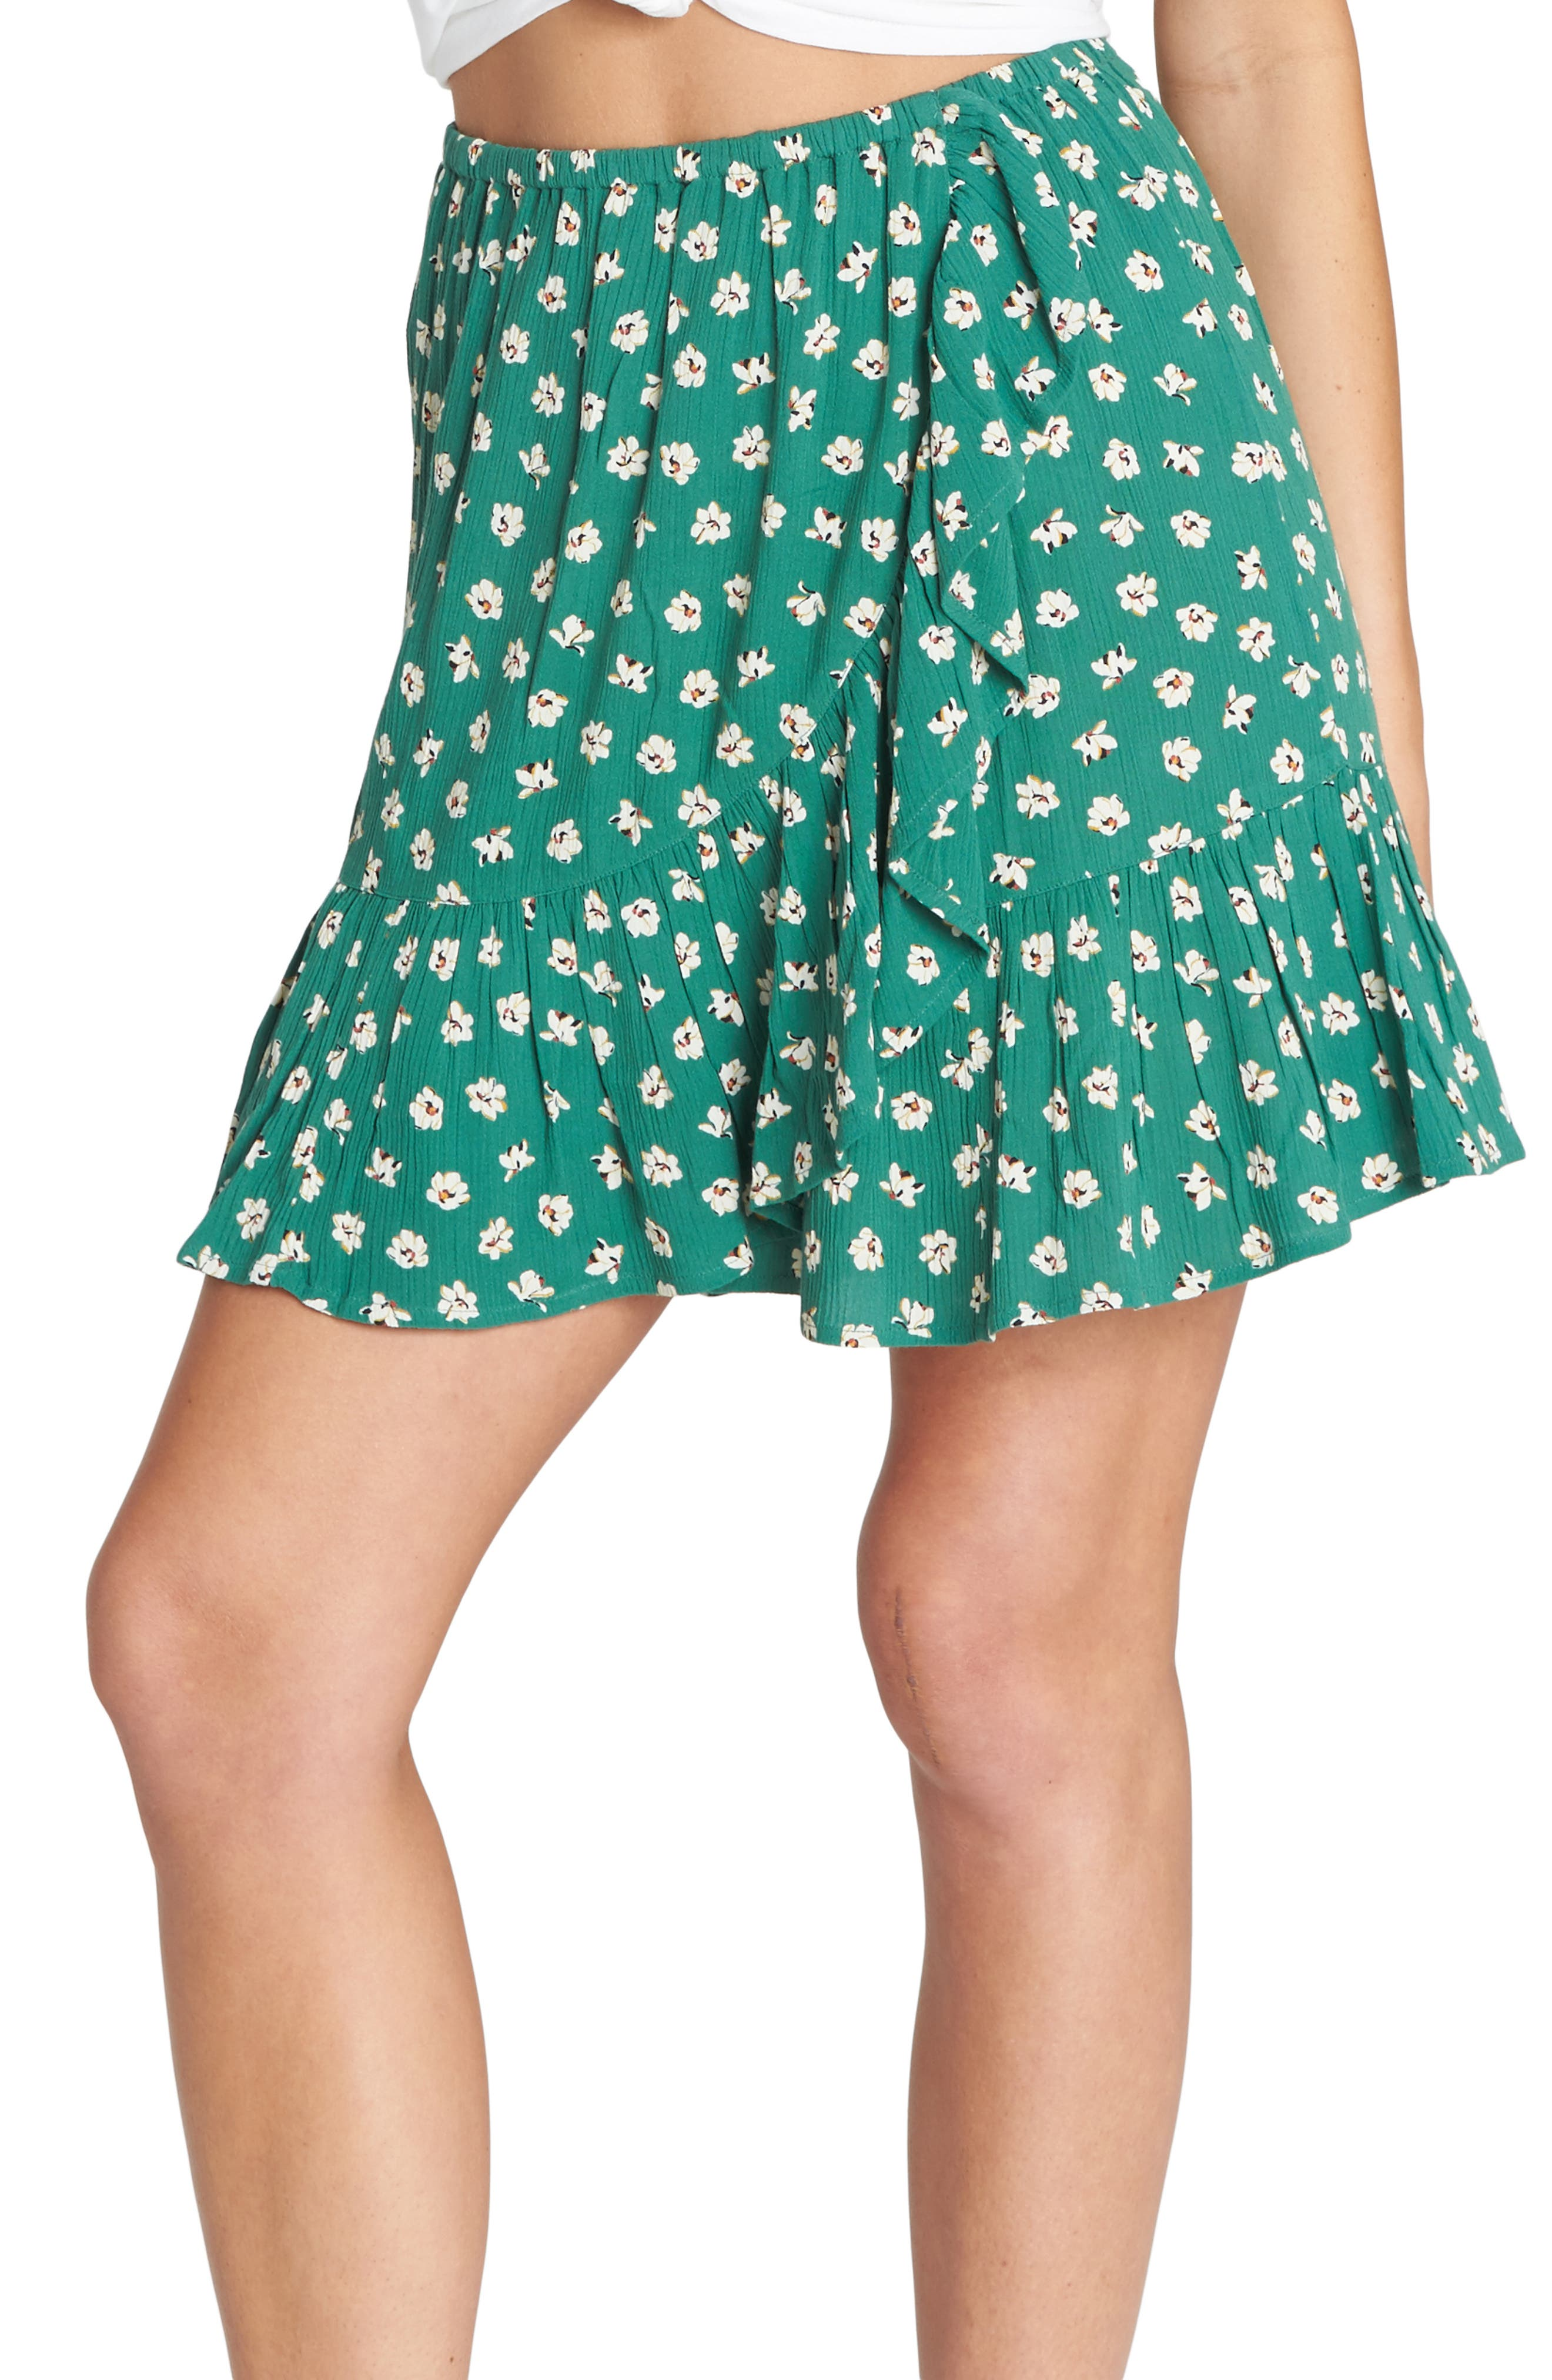 BILLABONG,                             For the Ride Floral Print Faux Wrap Skirt,                             Main thumbnail 1, color,                             ISLAND GREEN